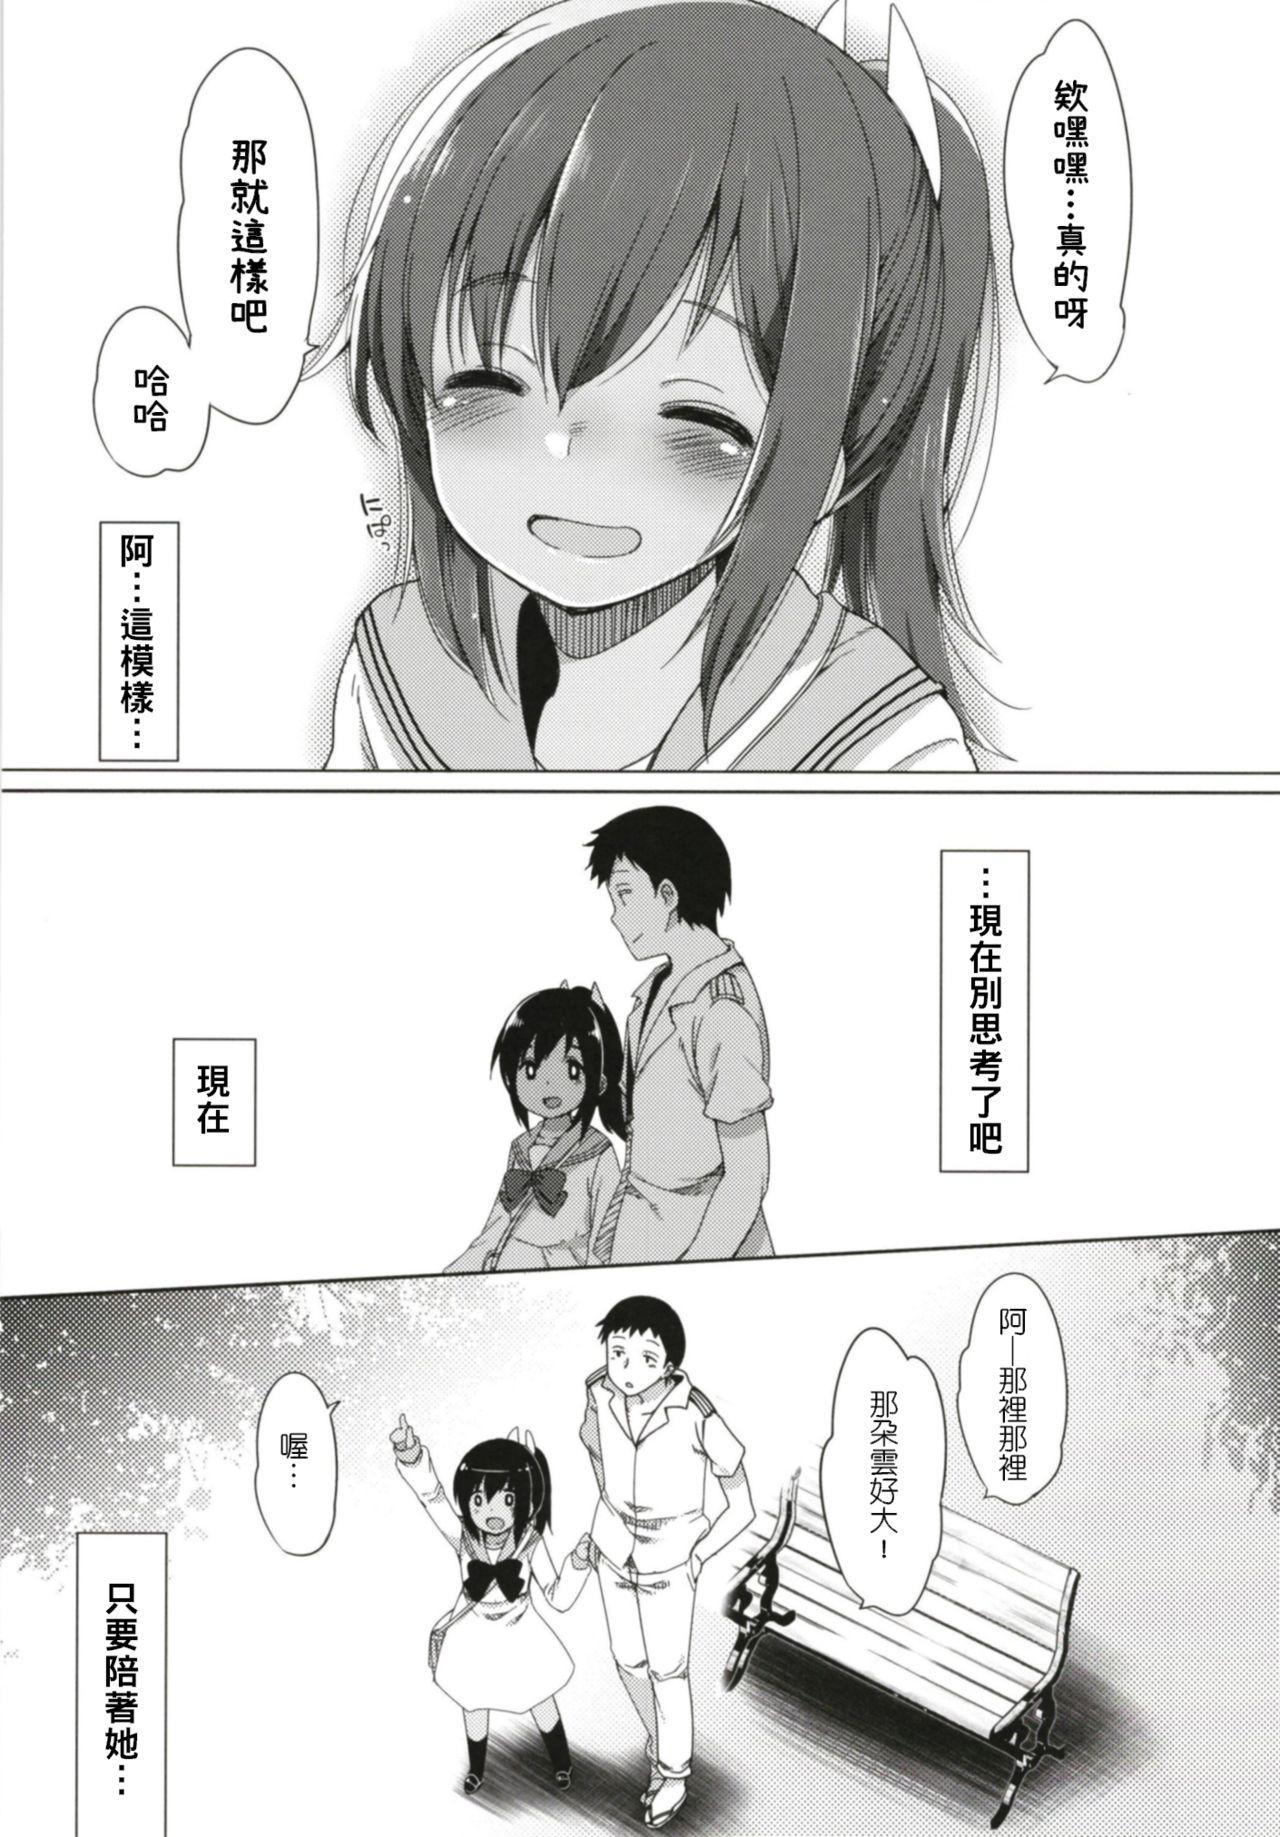 [French letter (Fujisaki Hikari)] Hitonatsu no Ayamachi -I-401 Soushuuhen- (Kantai Collection -KanColle-) [Chinese] [Digital] 30